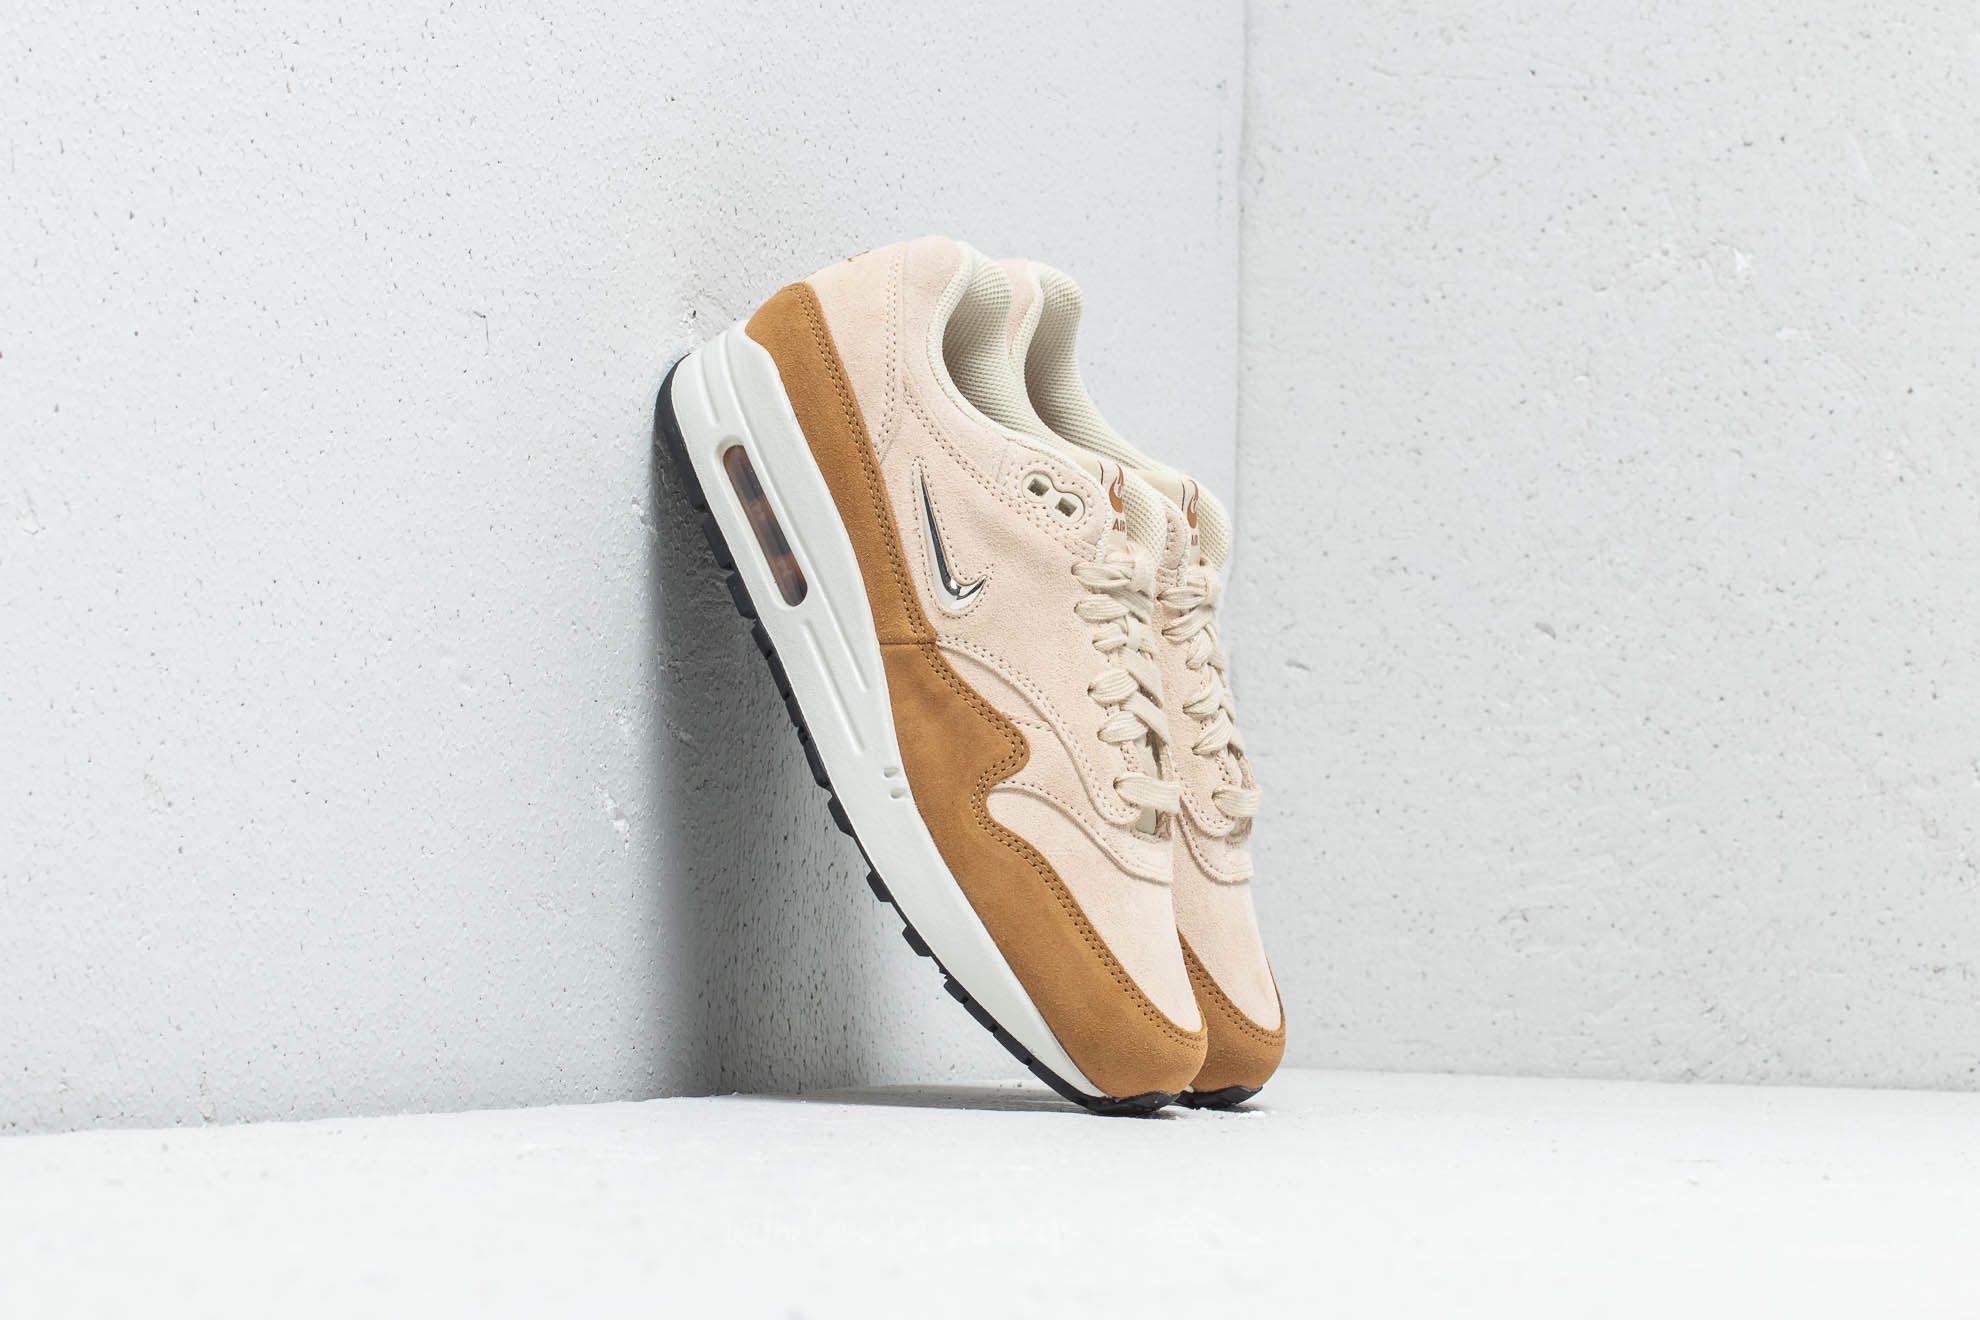 Dámské tenisky a boty Nike Wmns Air Max 1 Premium SC Beach/ Metallic Gold Grain